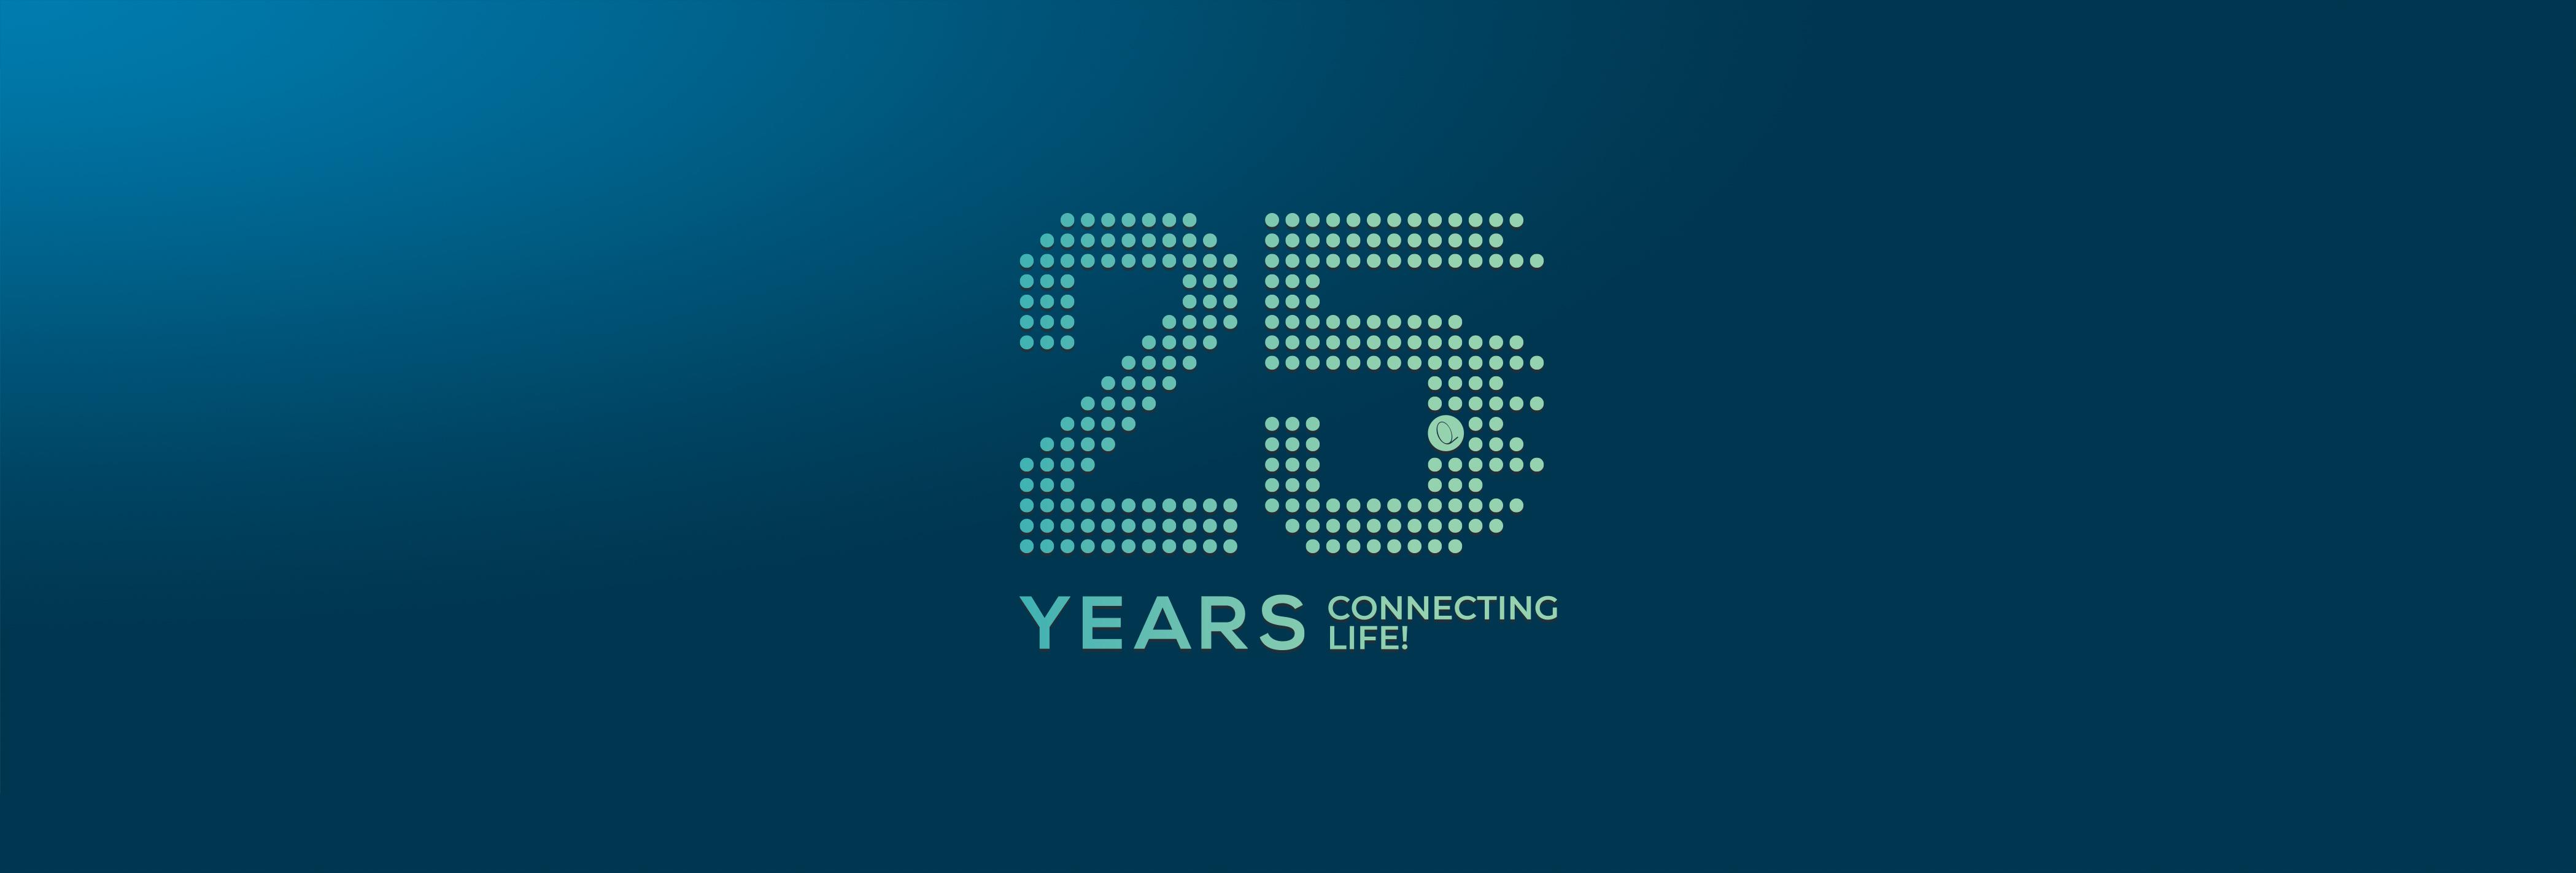 25 banner 3